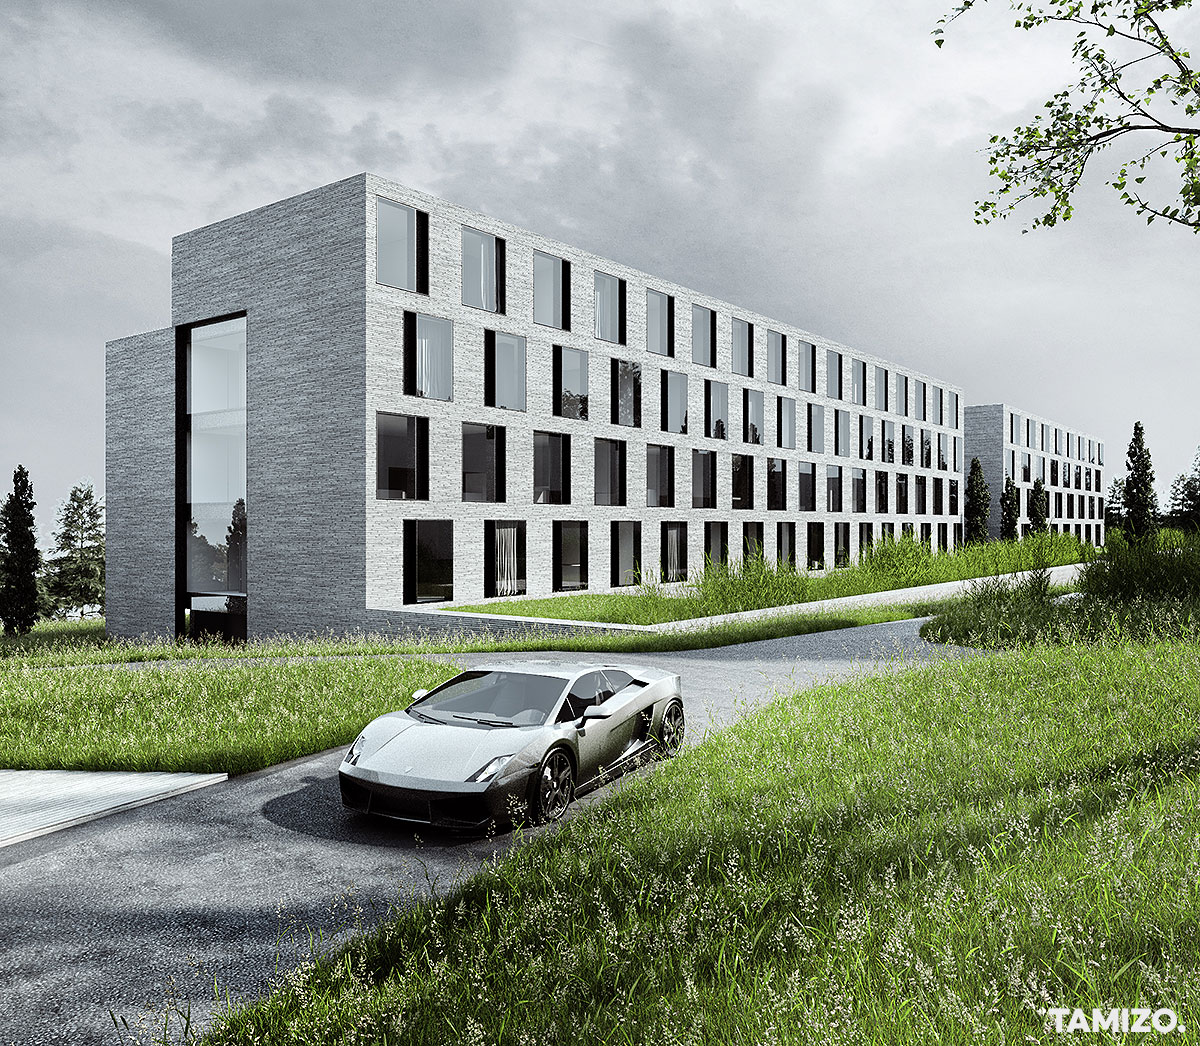 A061_tamizo_architects_competition_tbilisi_georgia_multifamily_houseing_realestate_20